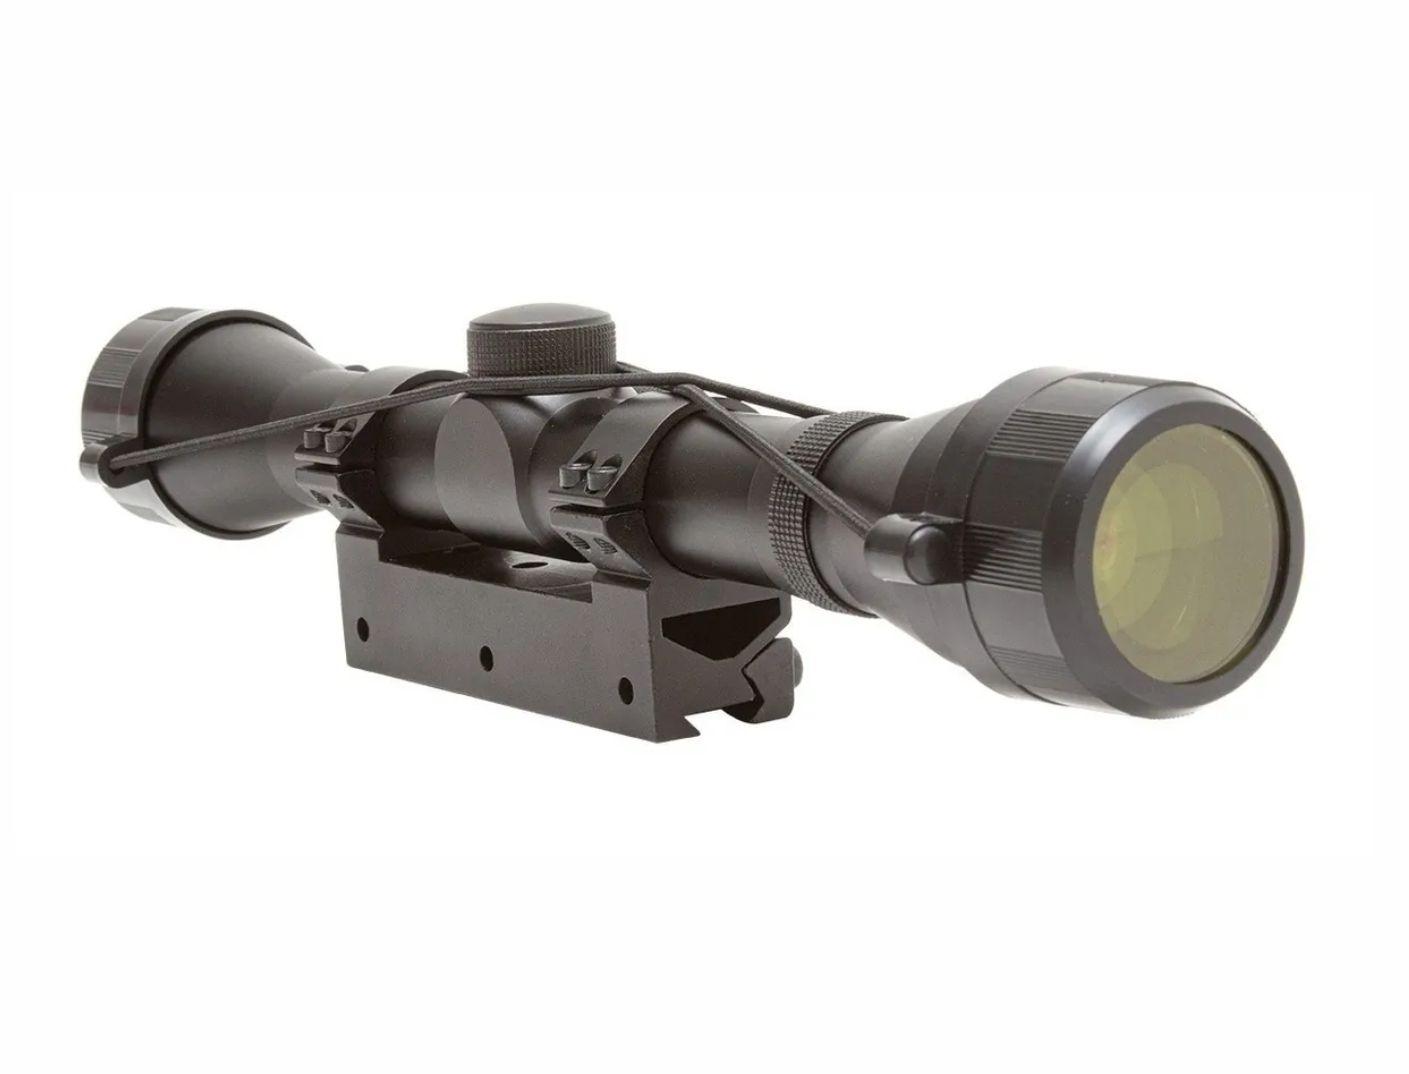 Carabina  SAG R1000 5.5 GR 60kg + Luneta 4x32 mount unico